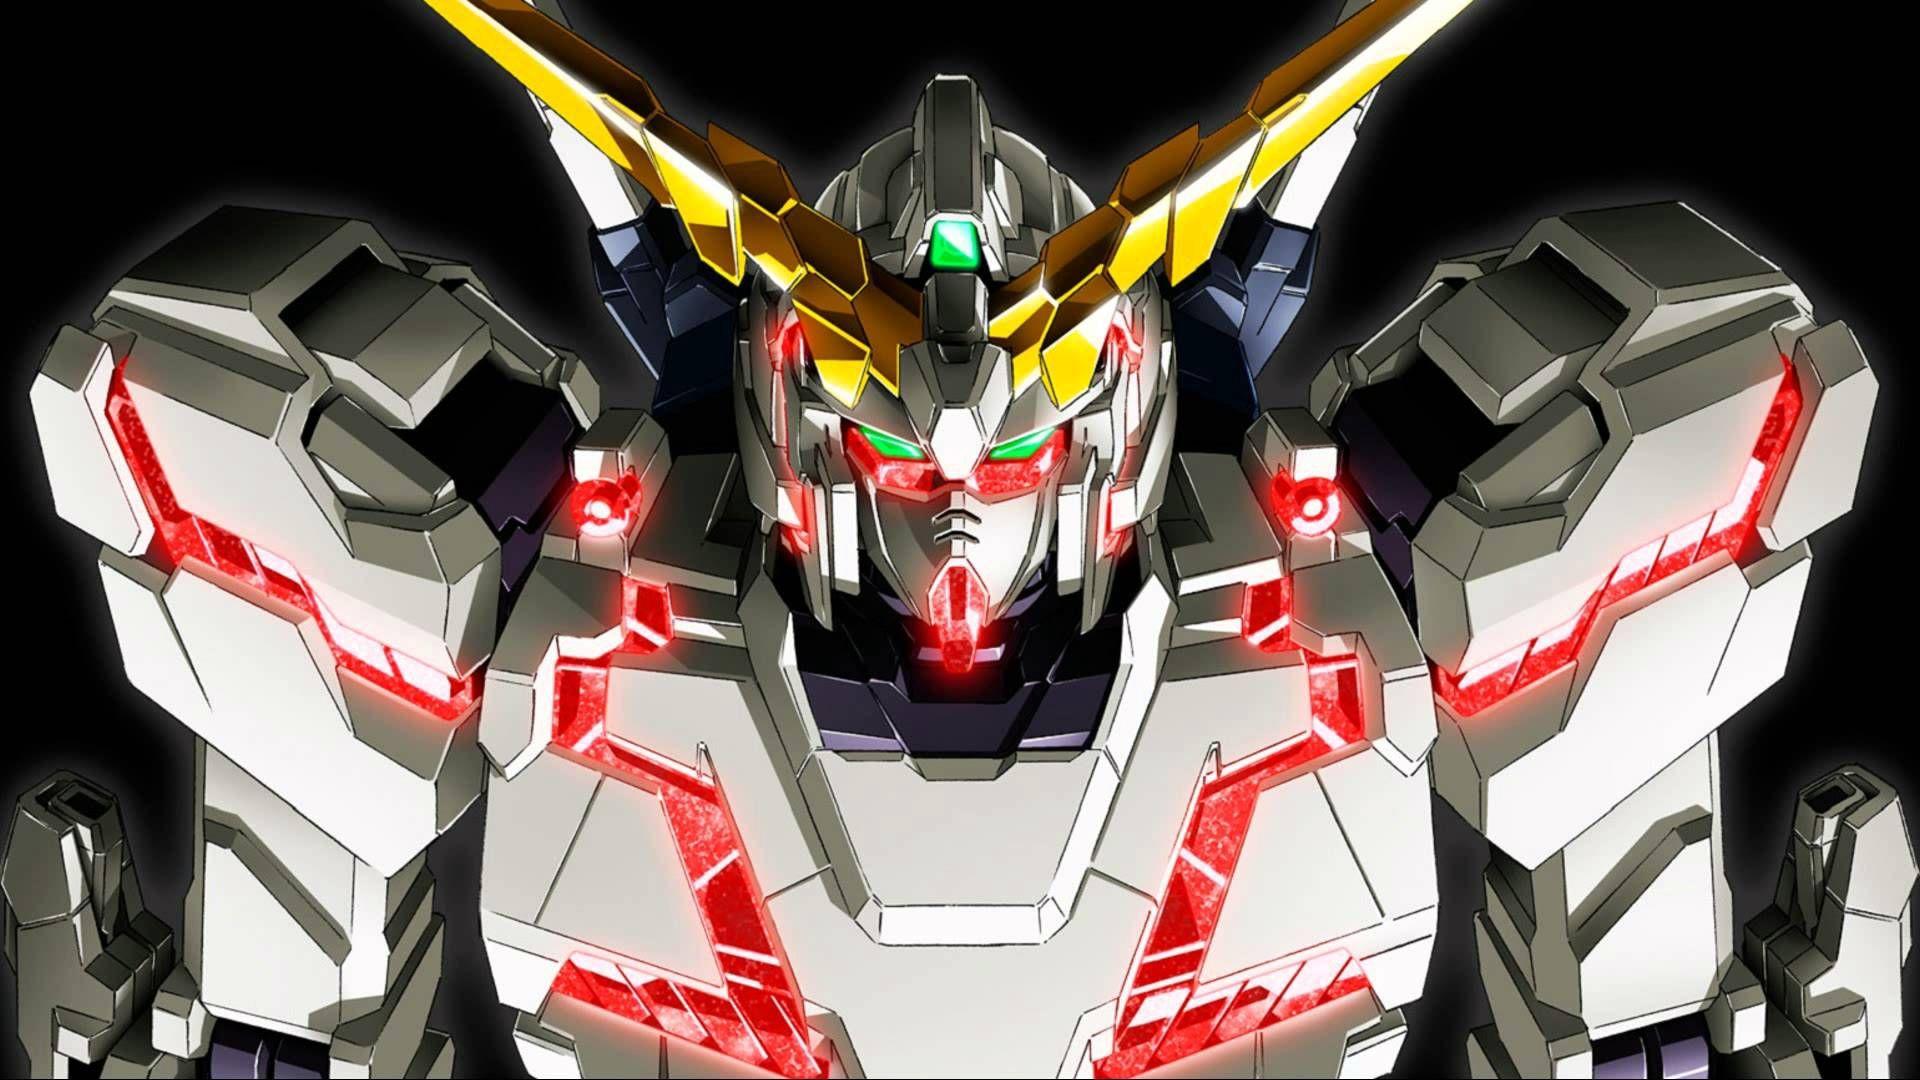 haruhi Gundam, Unicorn gundam, Mobile suit